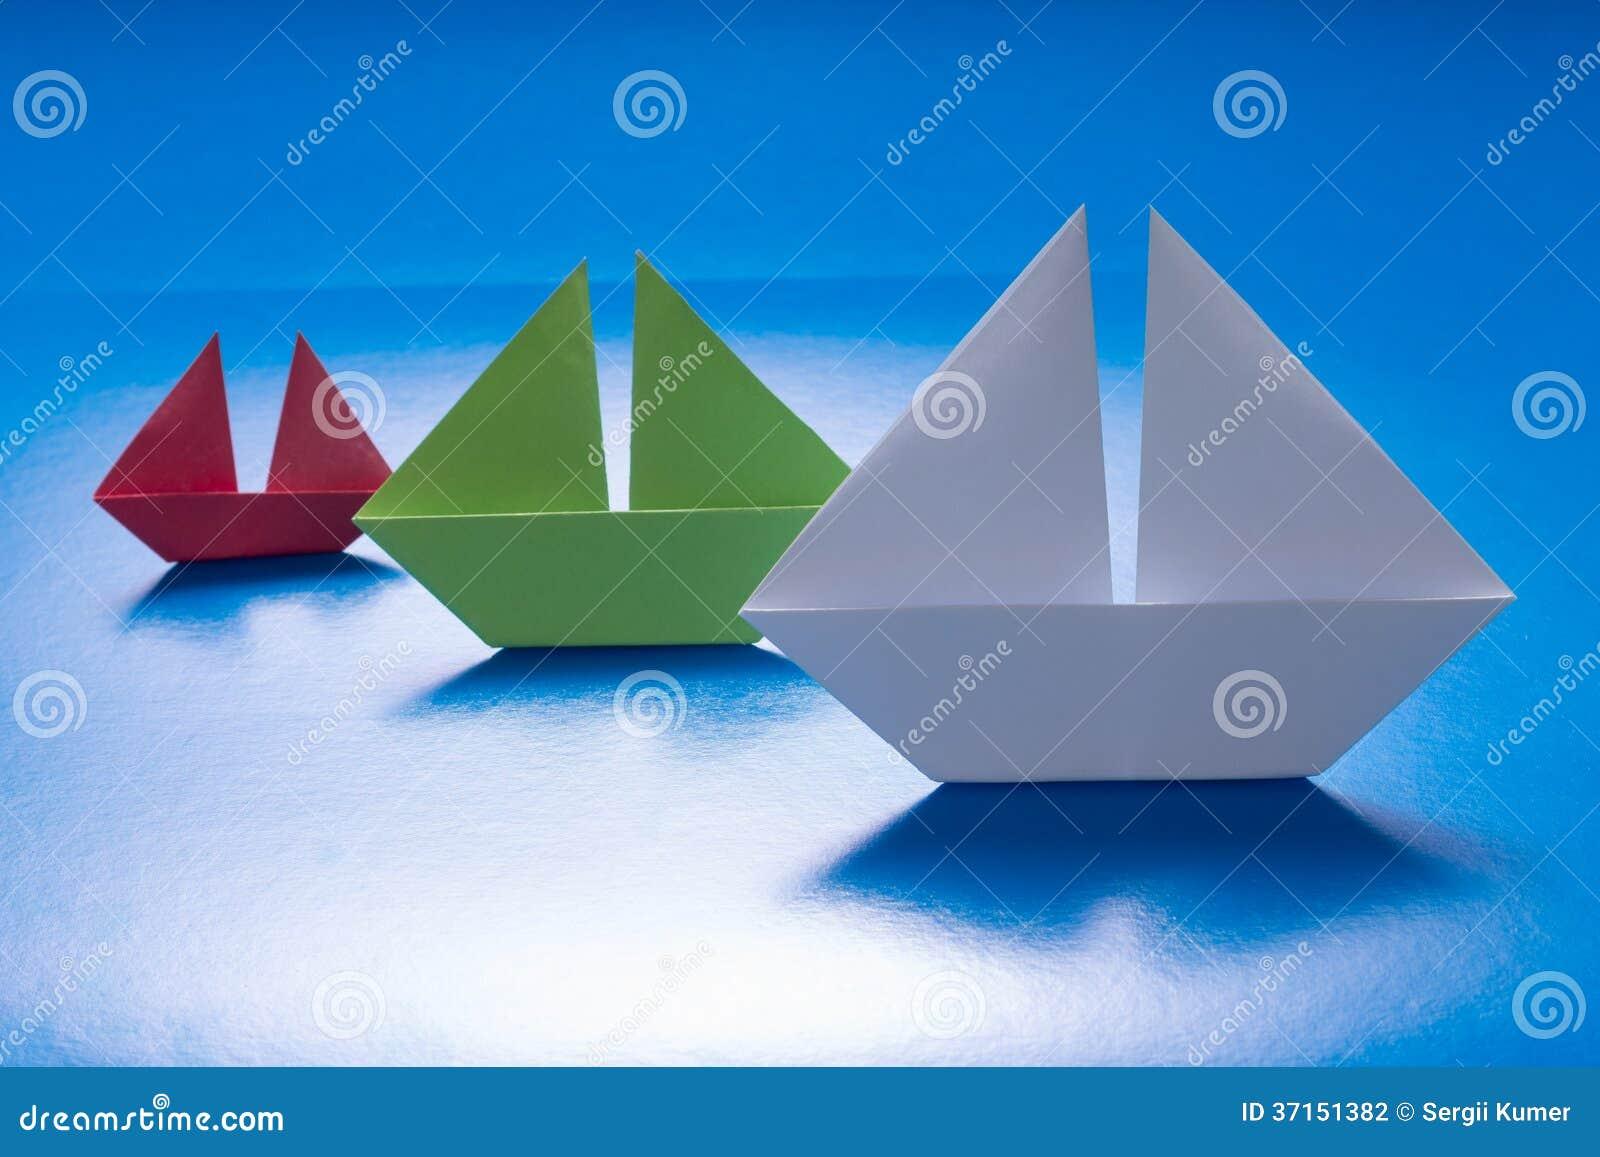 Origami Cruise Ship